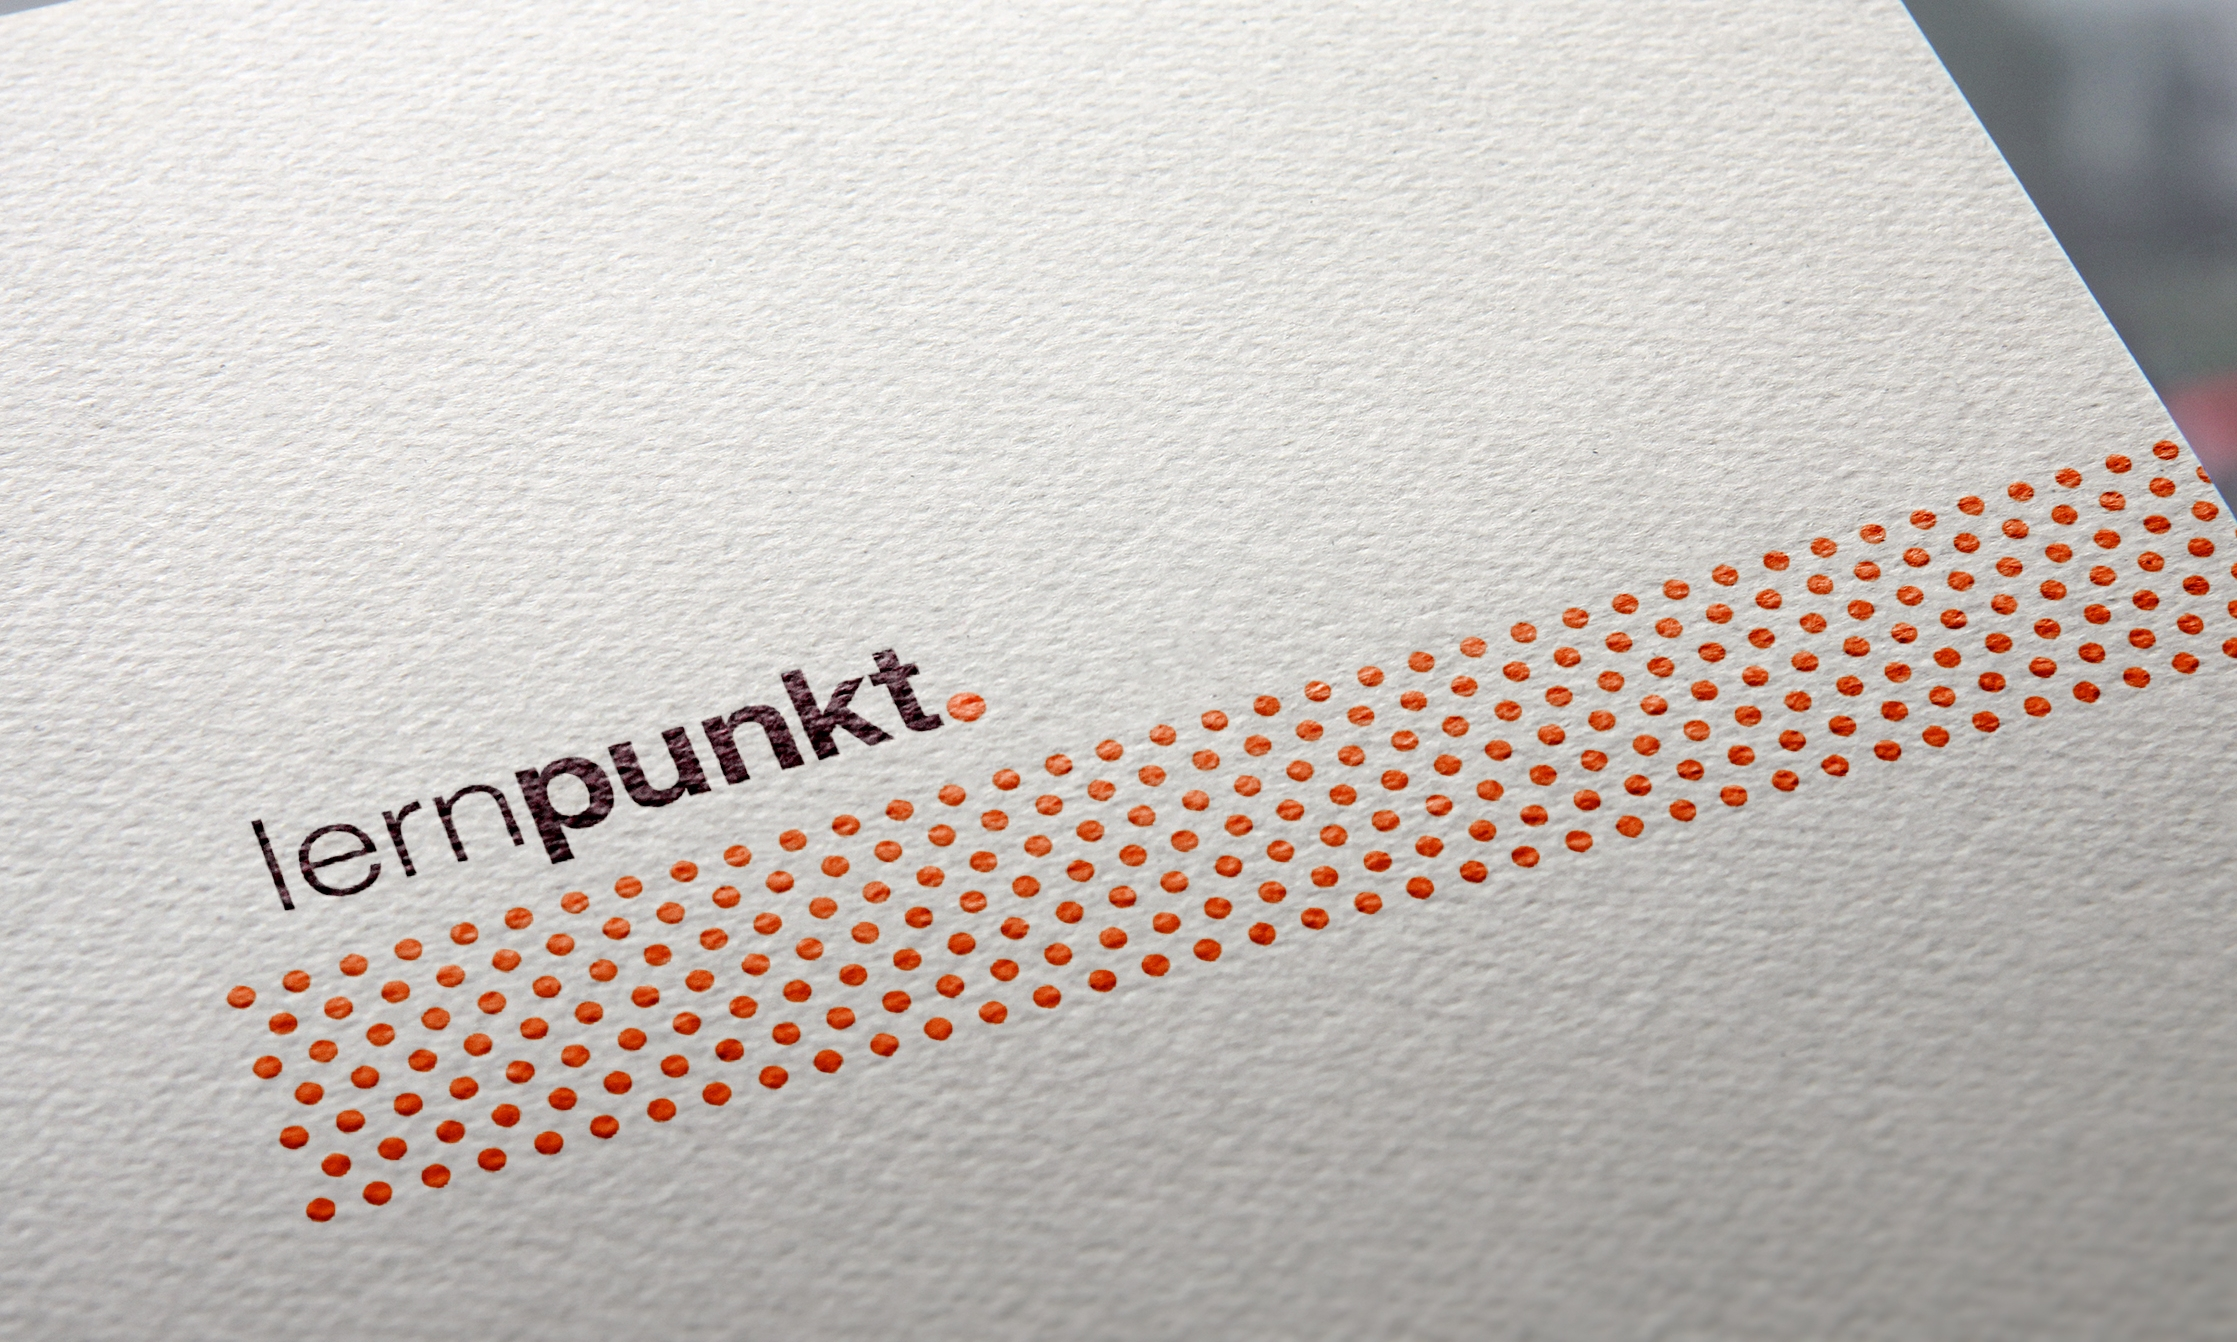 Lernpunkt_logo.jpg